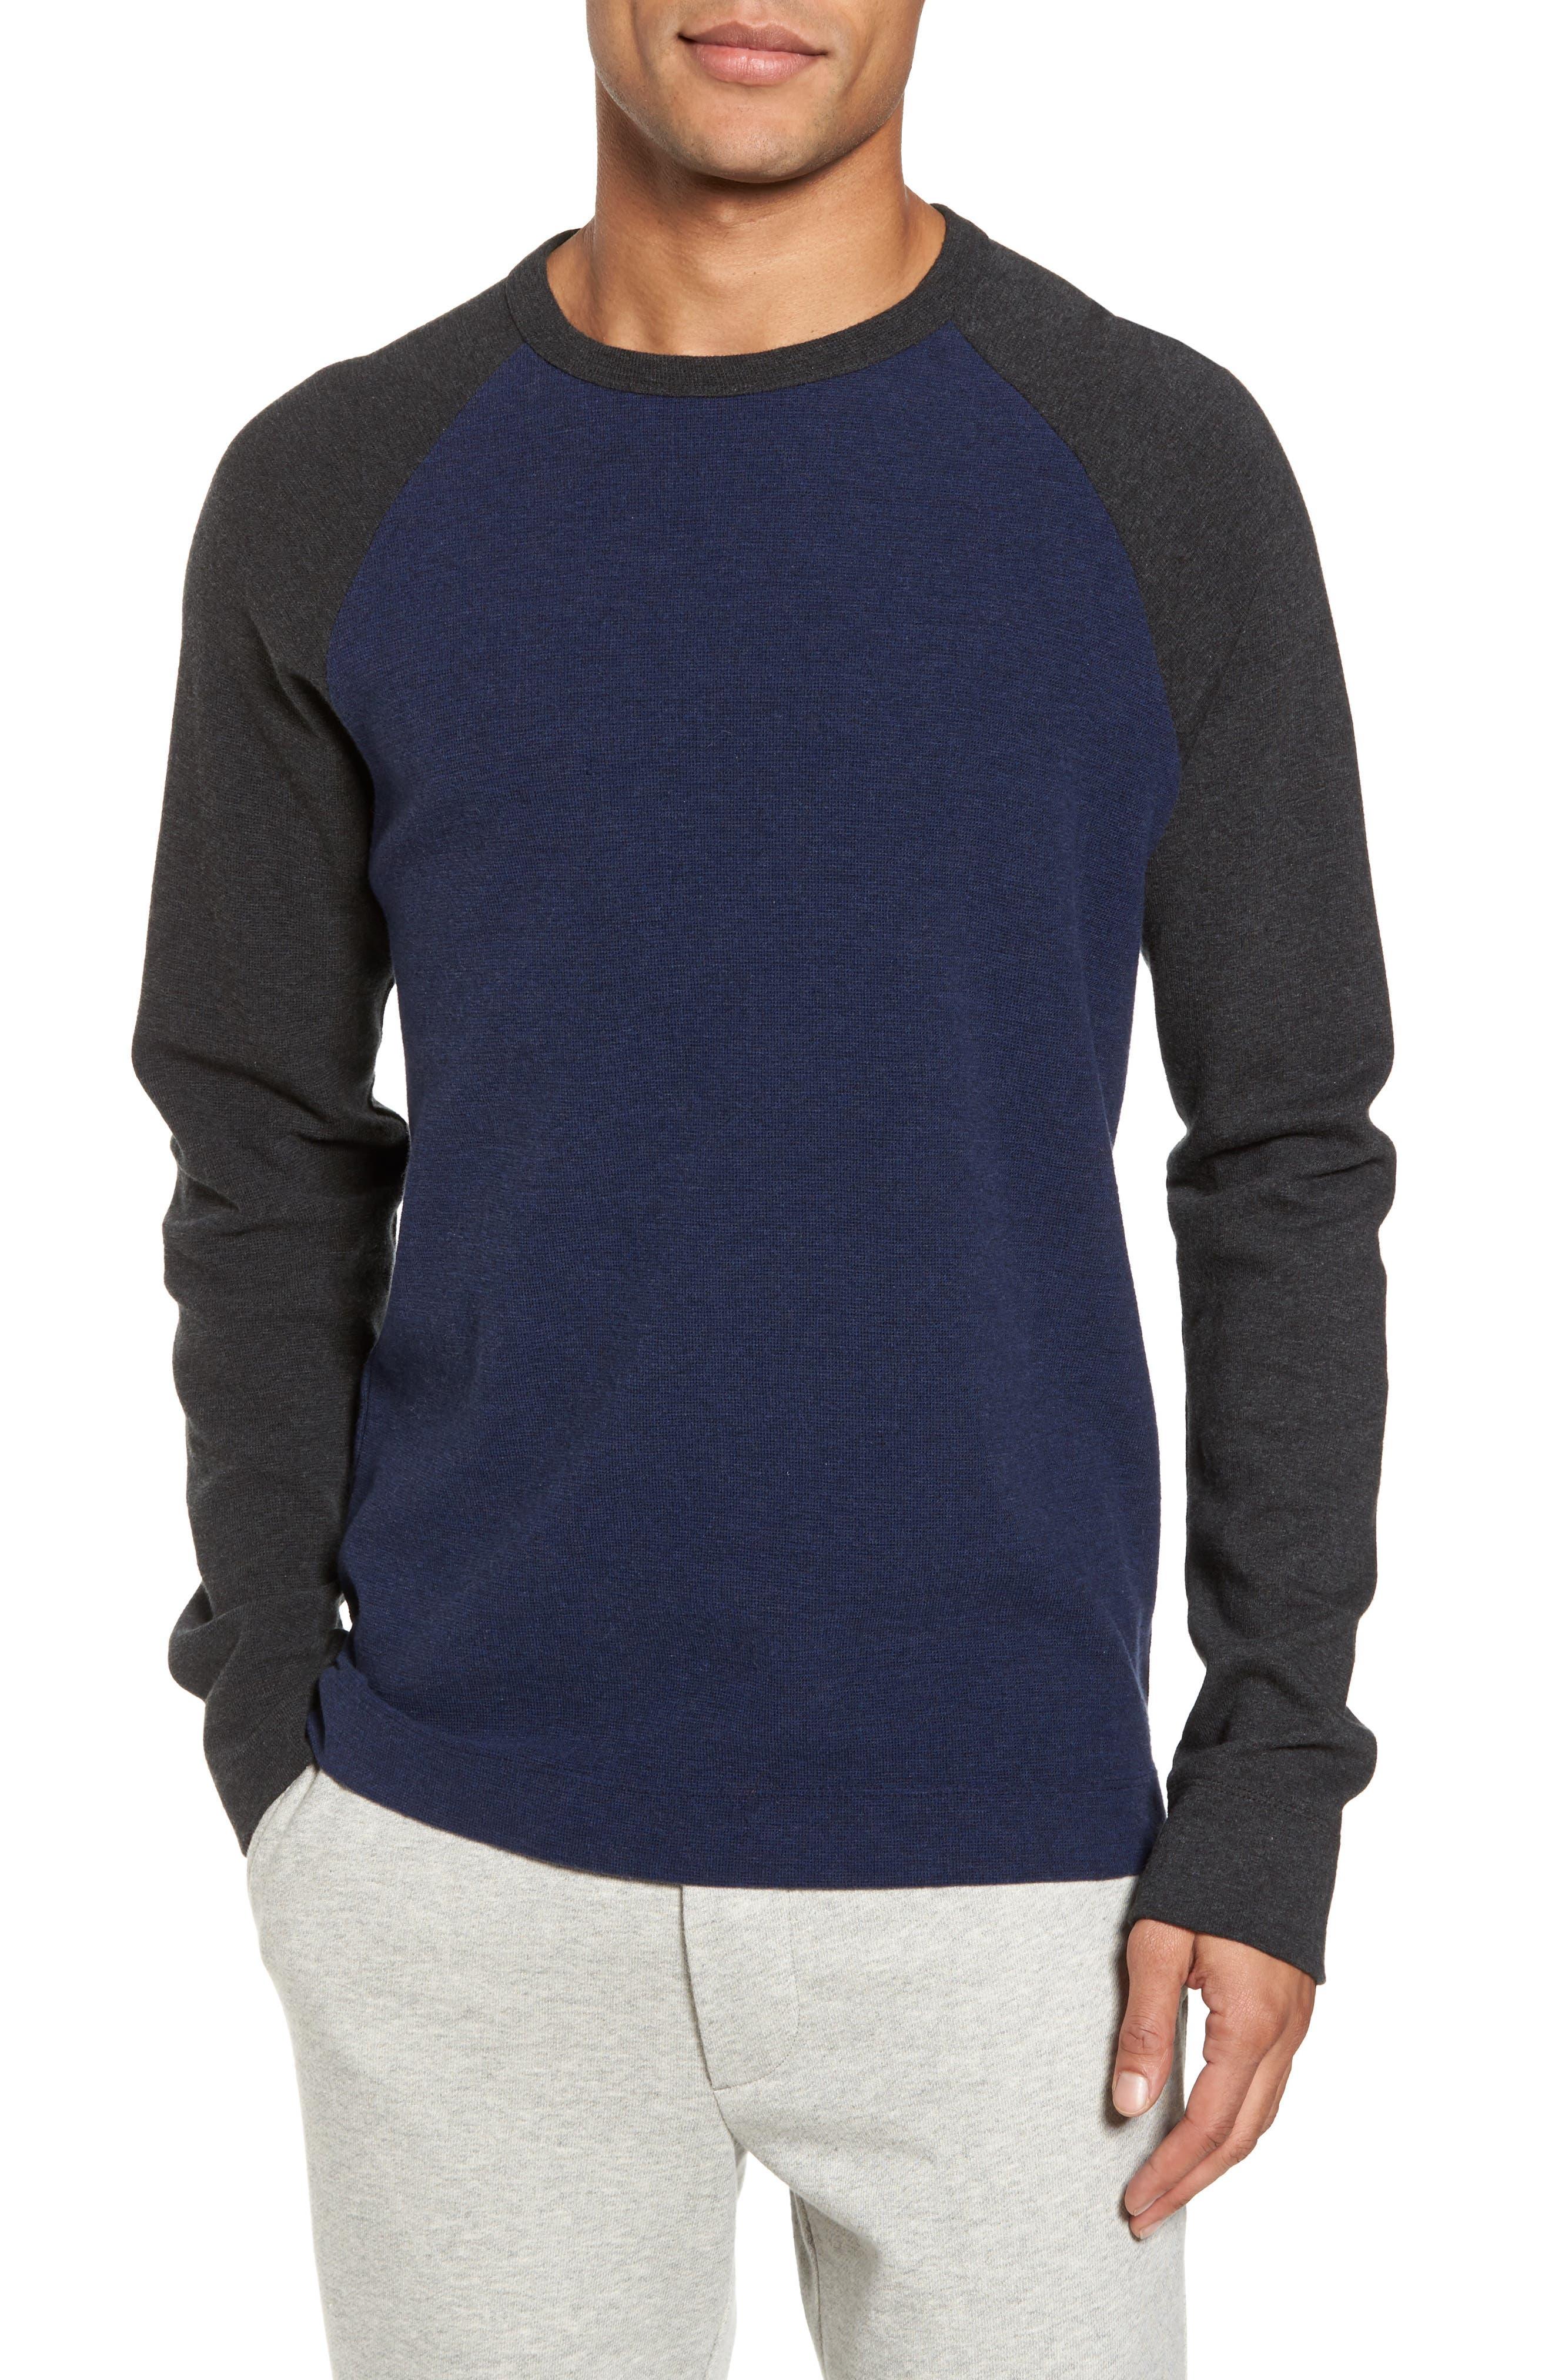 Thermal Knit Raglan Sweatshirt,                             Main thumbnail 1, color,                             Heather Navy/ Heather Charcoal